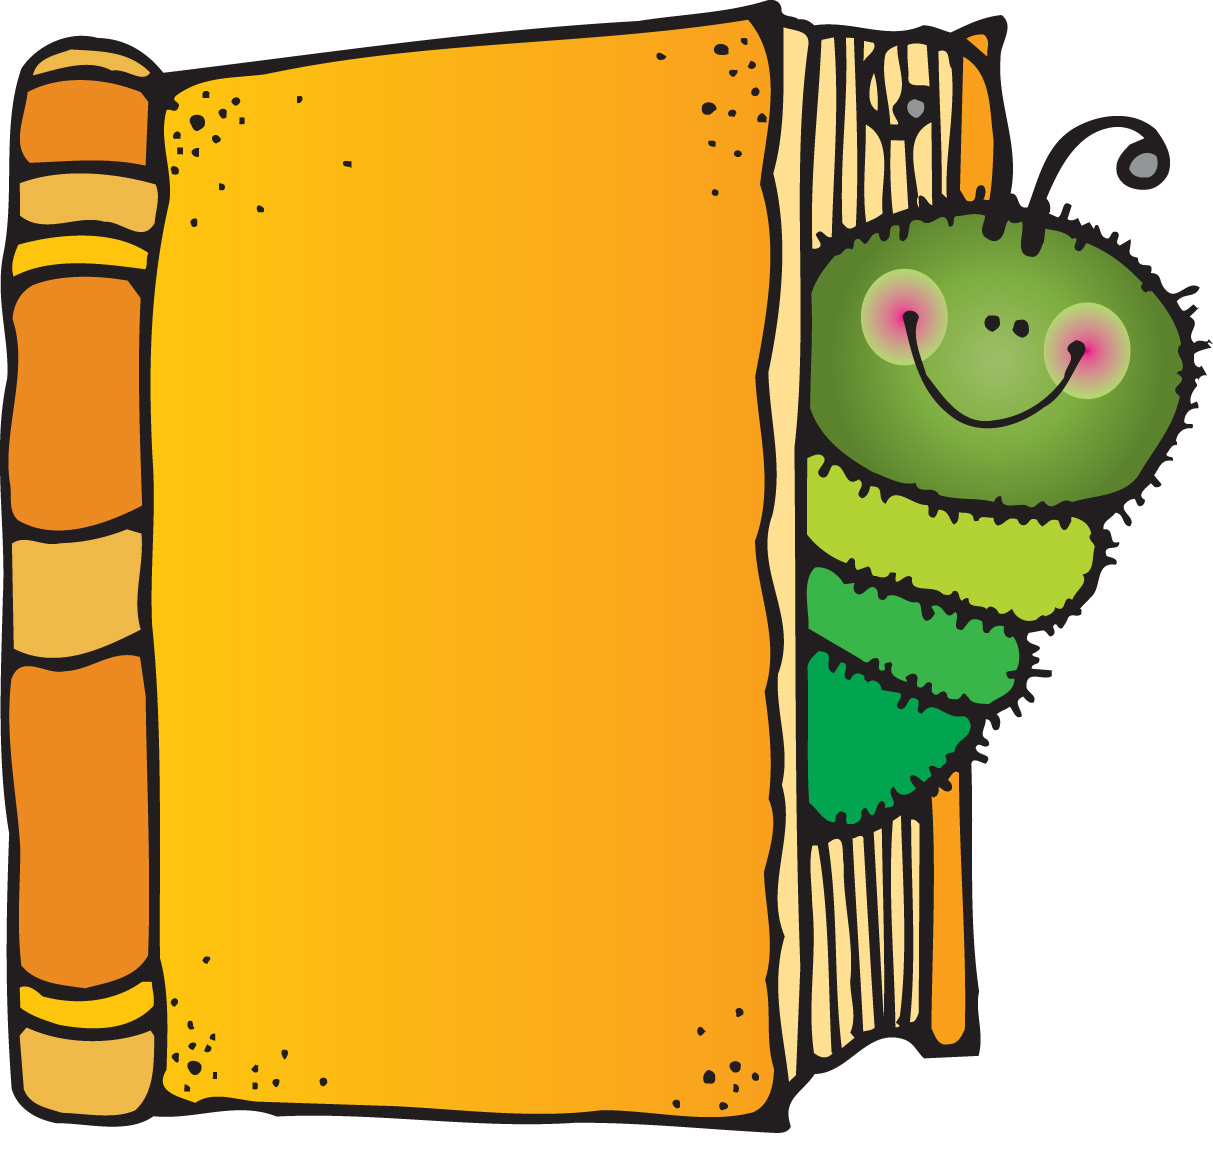 ... Book Club Clip Art - ClipArt Best ...